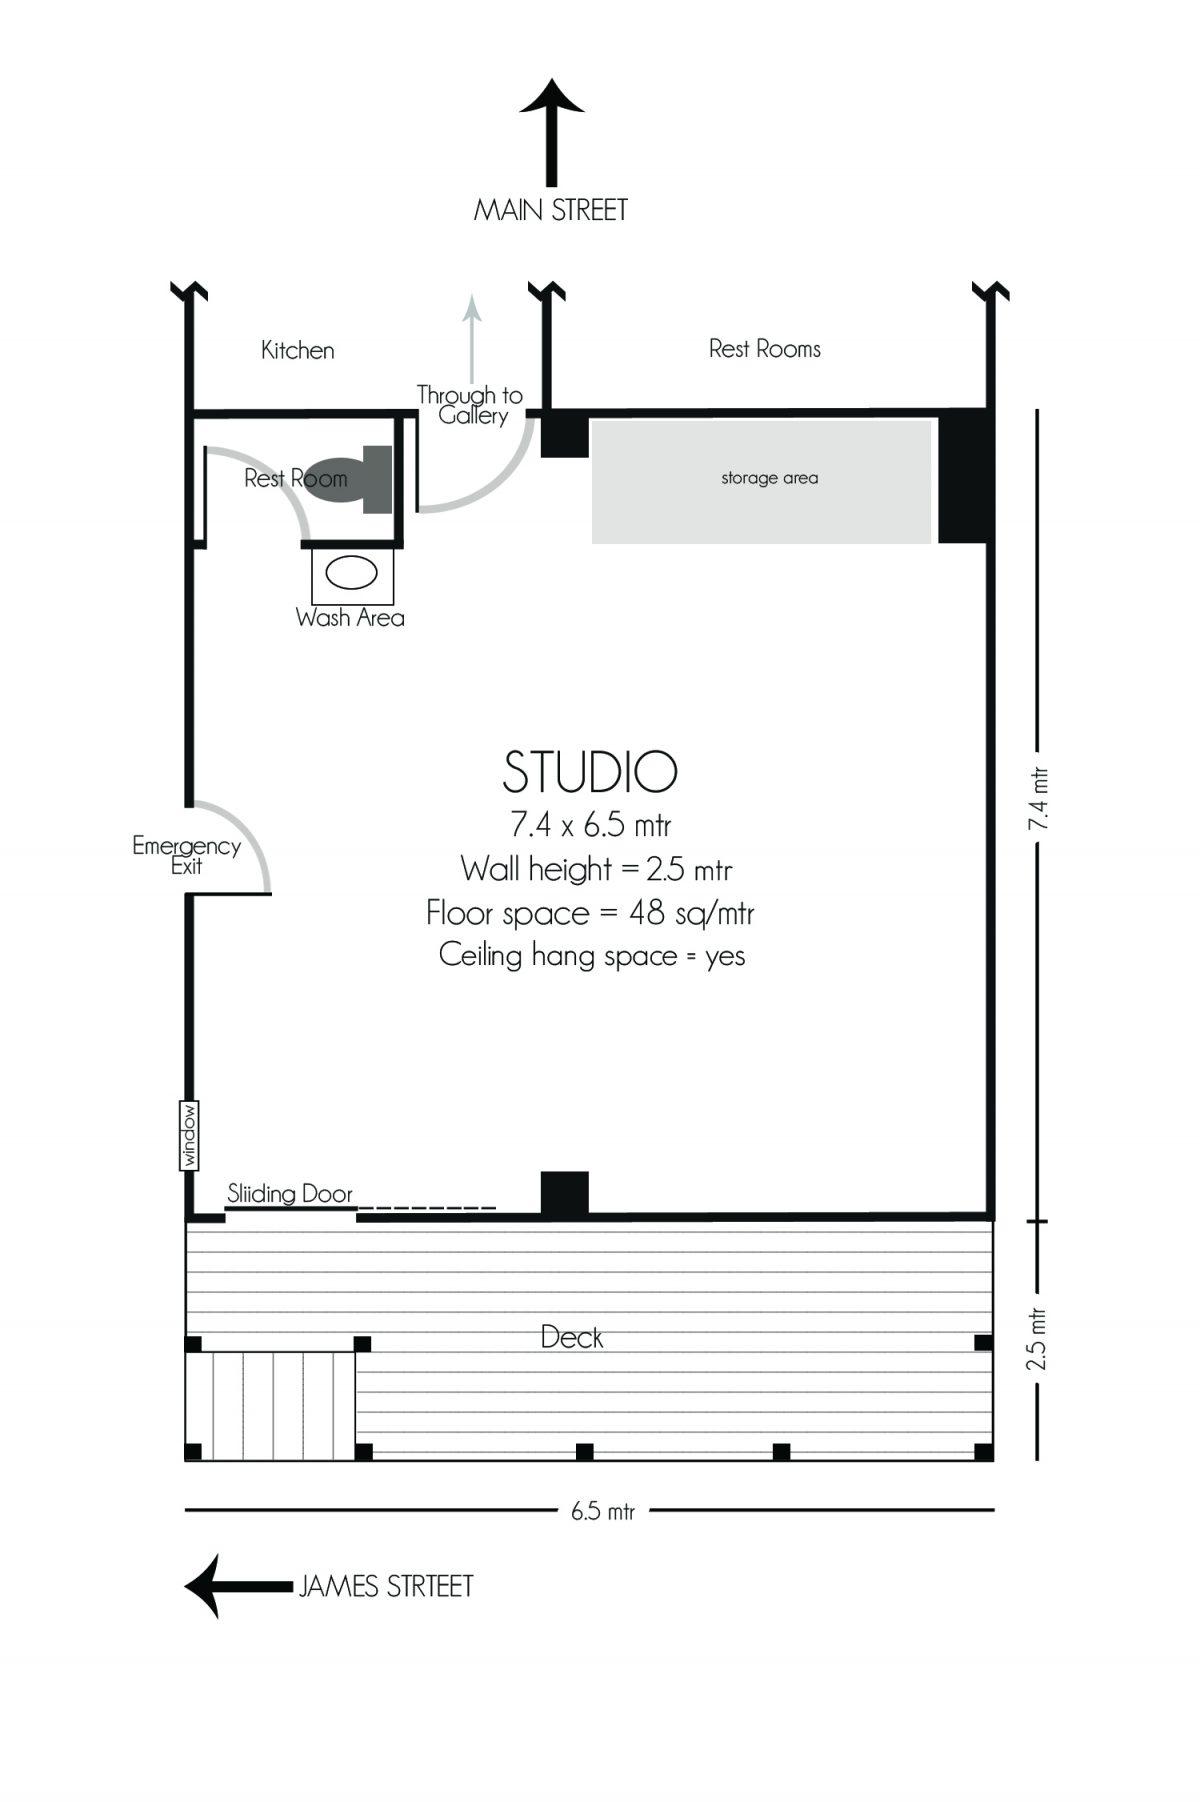 Workshop / Studio For Hire Gang Gang Gallery 2